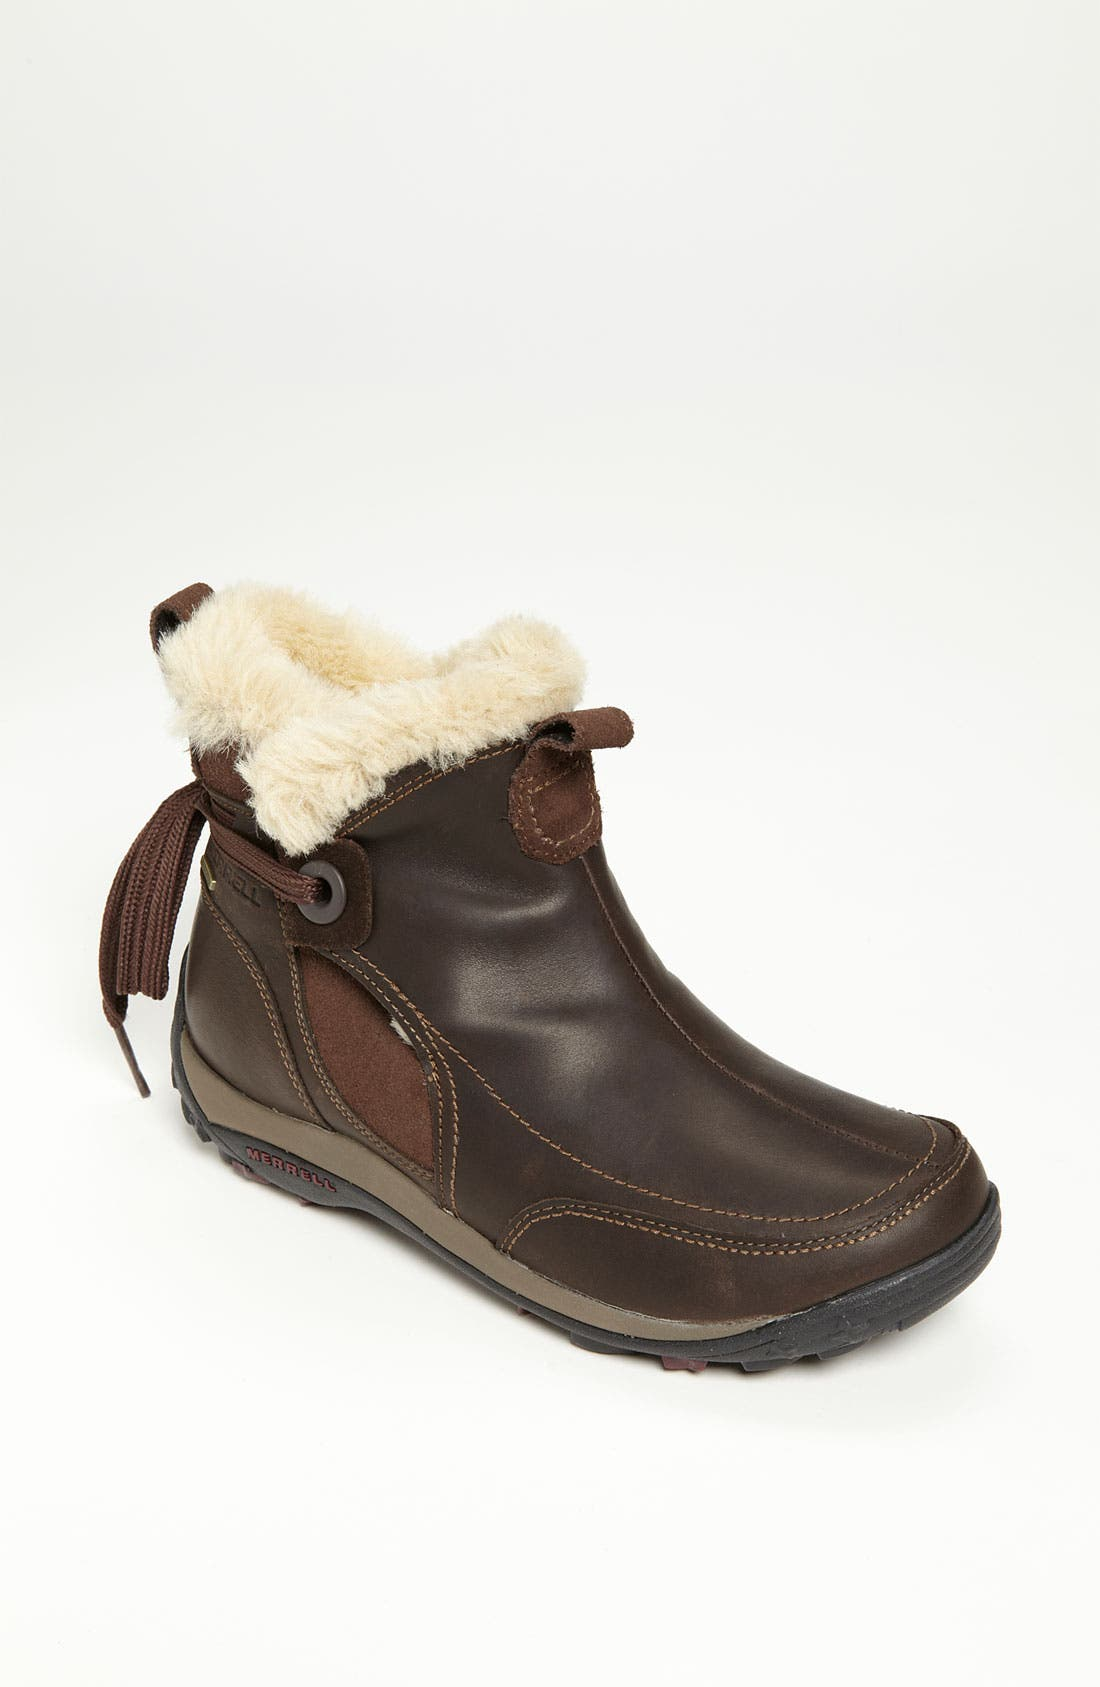 Alternate Image 1 Selected - Merrell 'Misha' Waterproof Boot (Women)